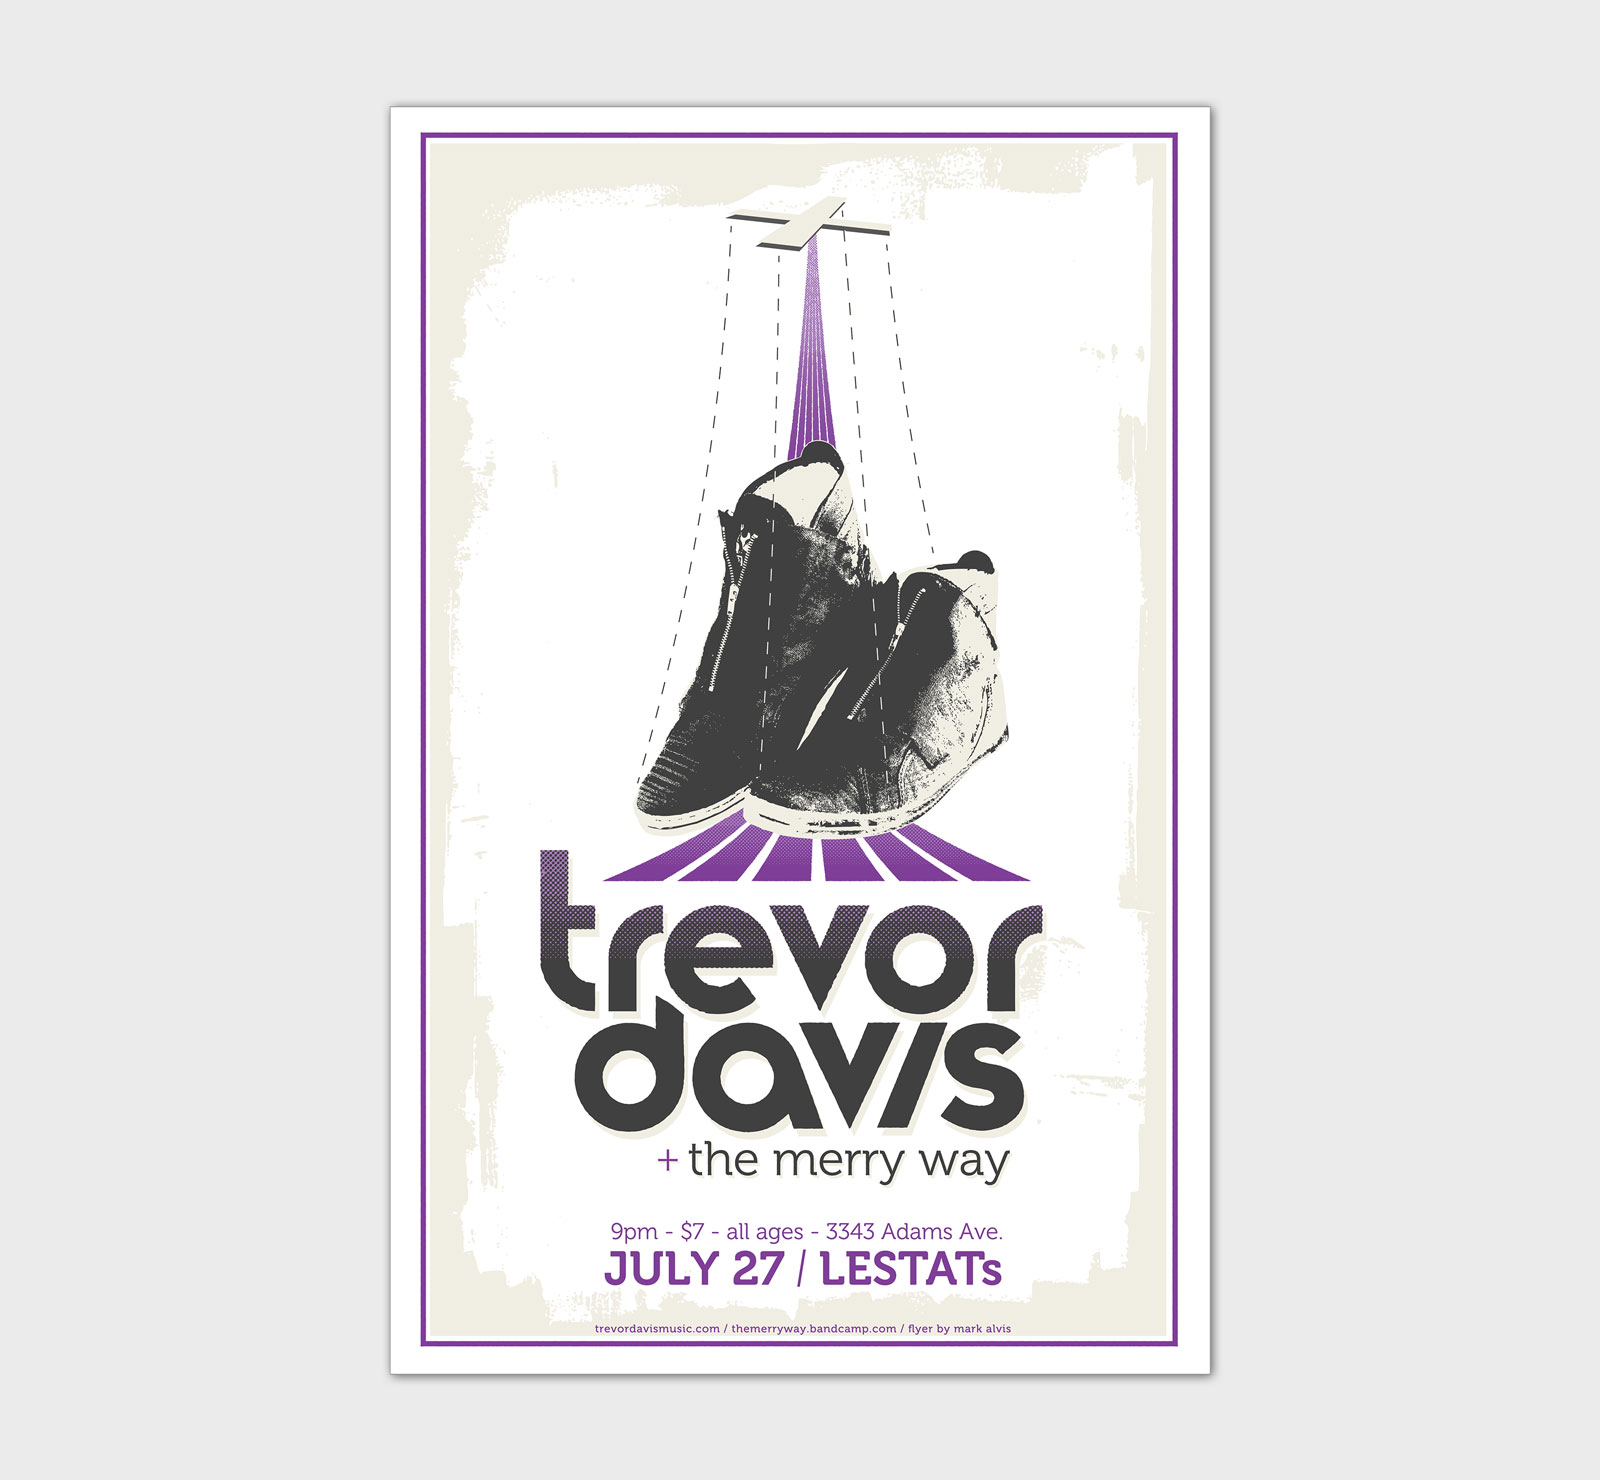 TrevorDavis_LeStats.jpg